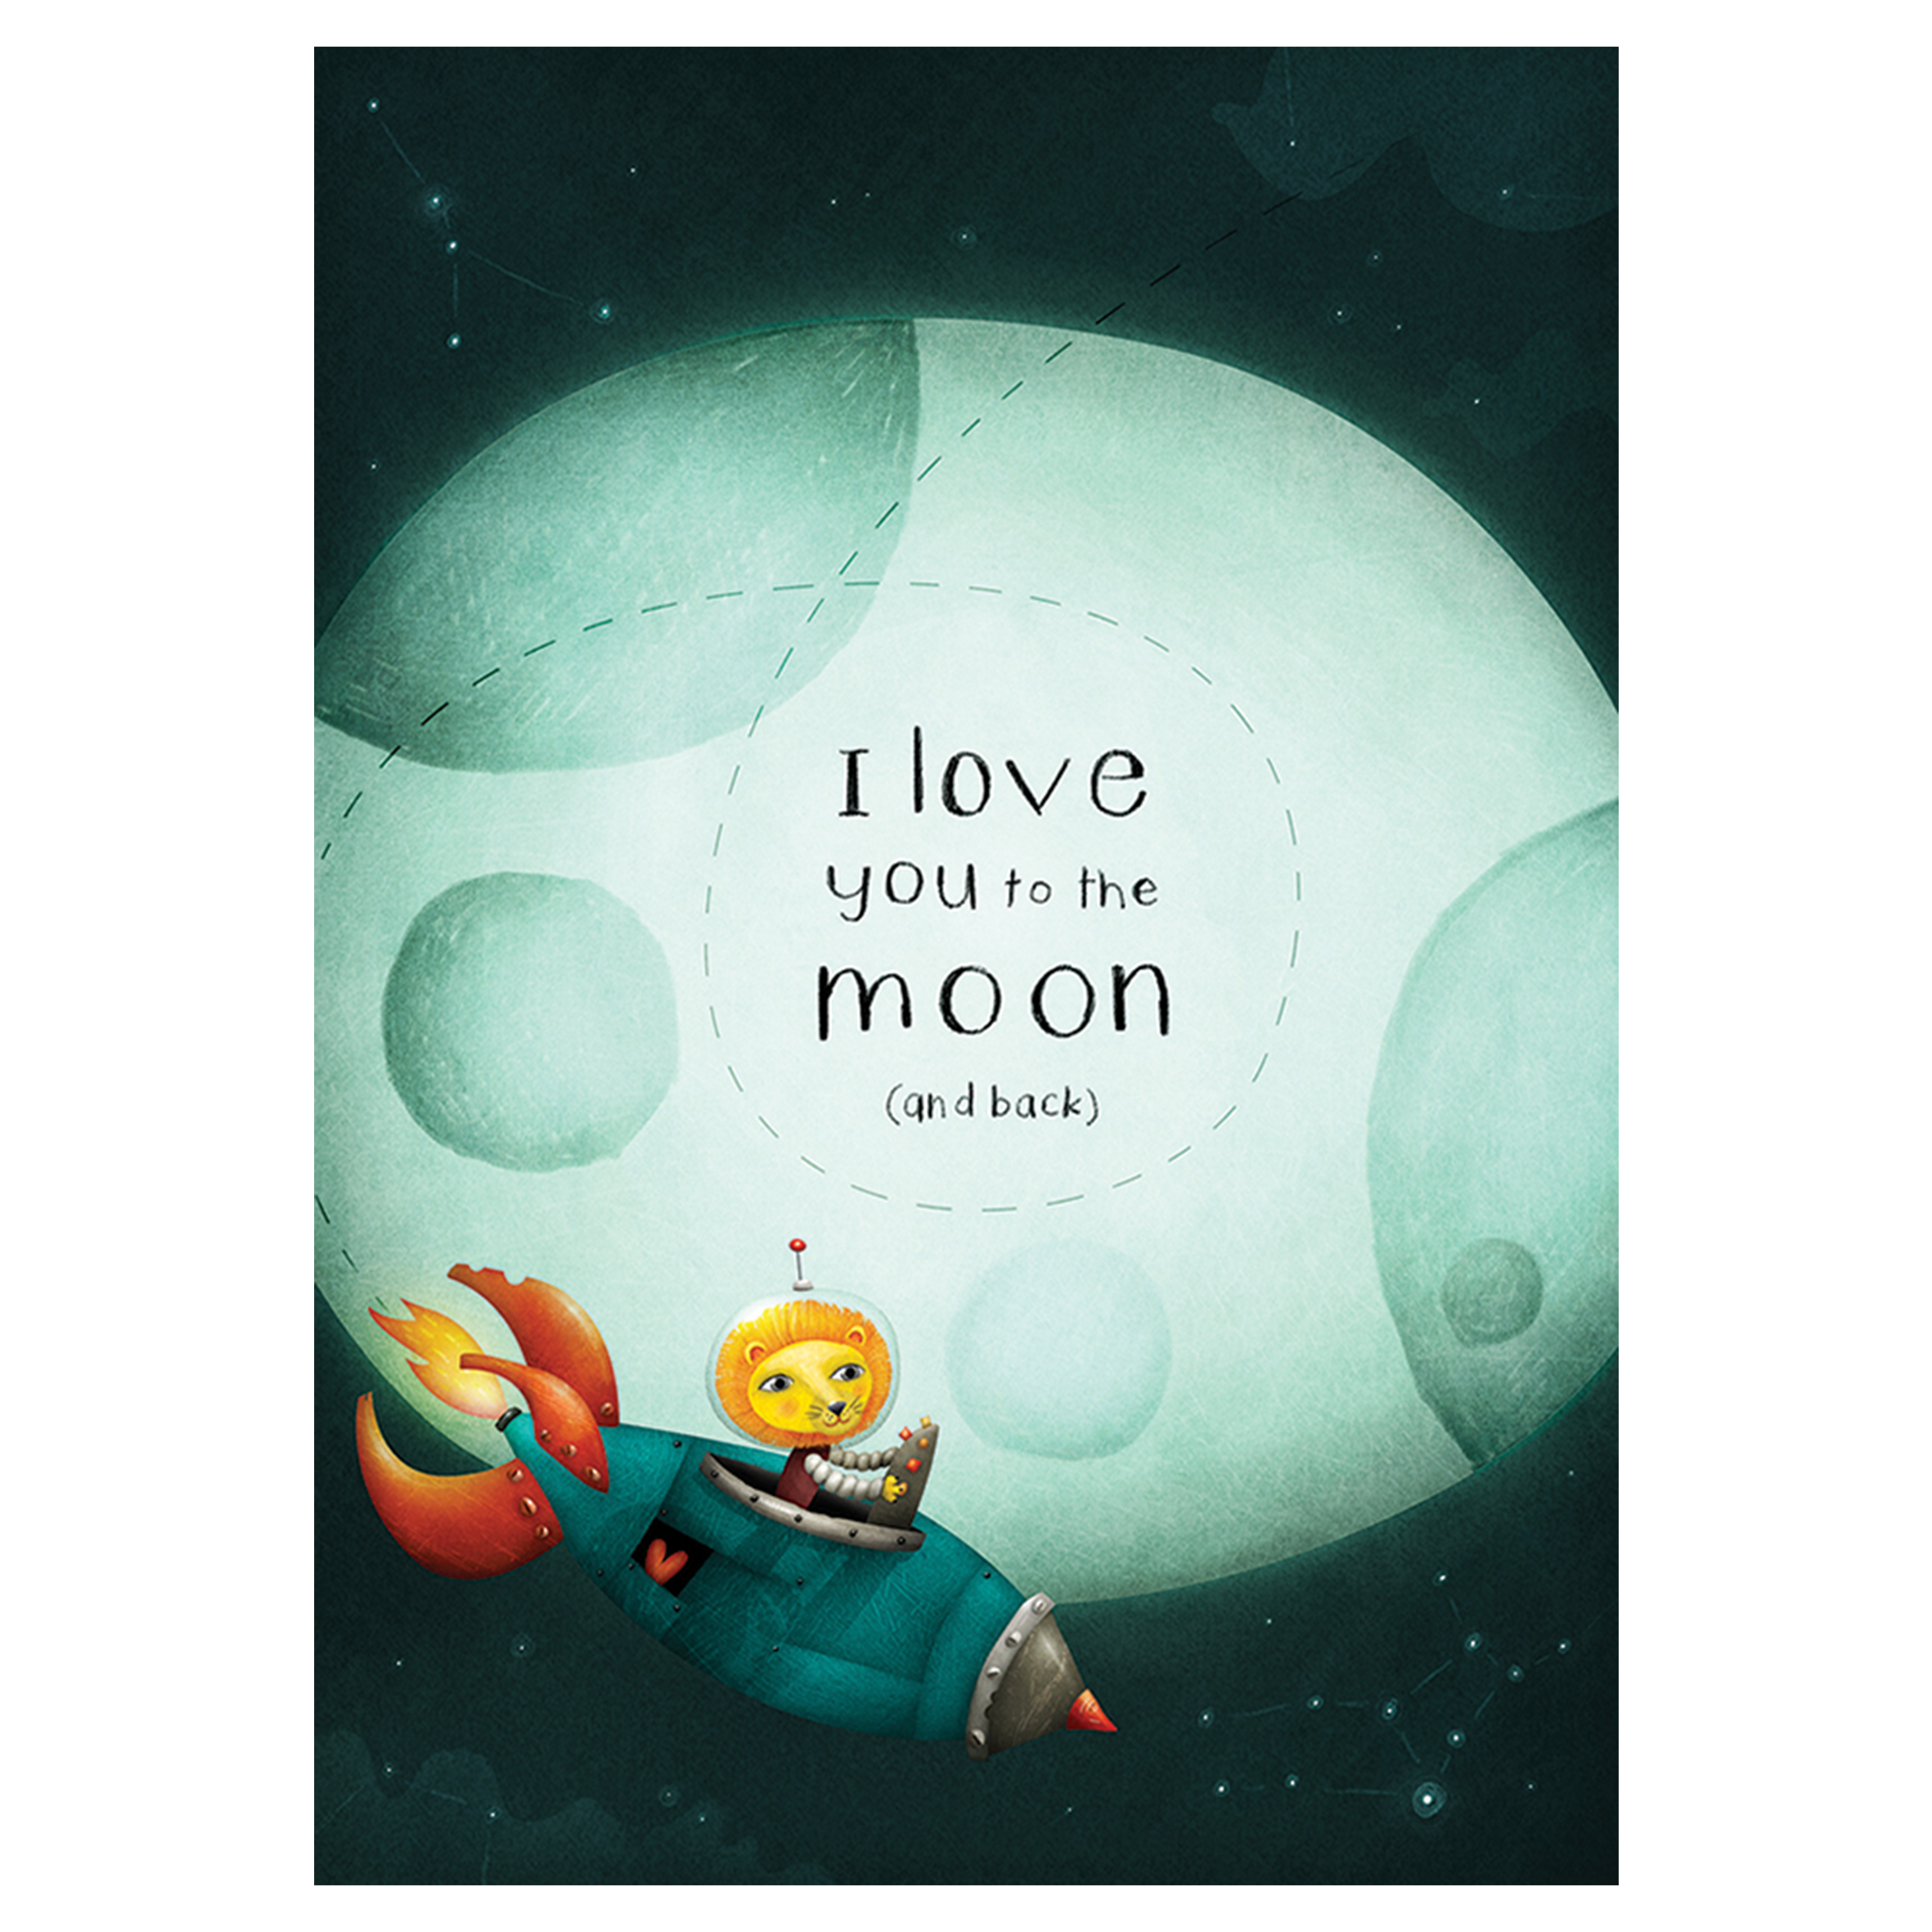 Lea-vervoort-to-the-moon